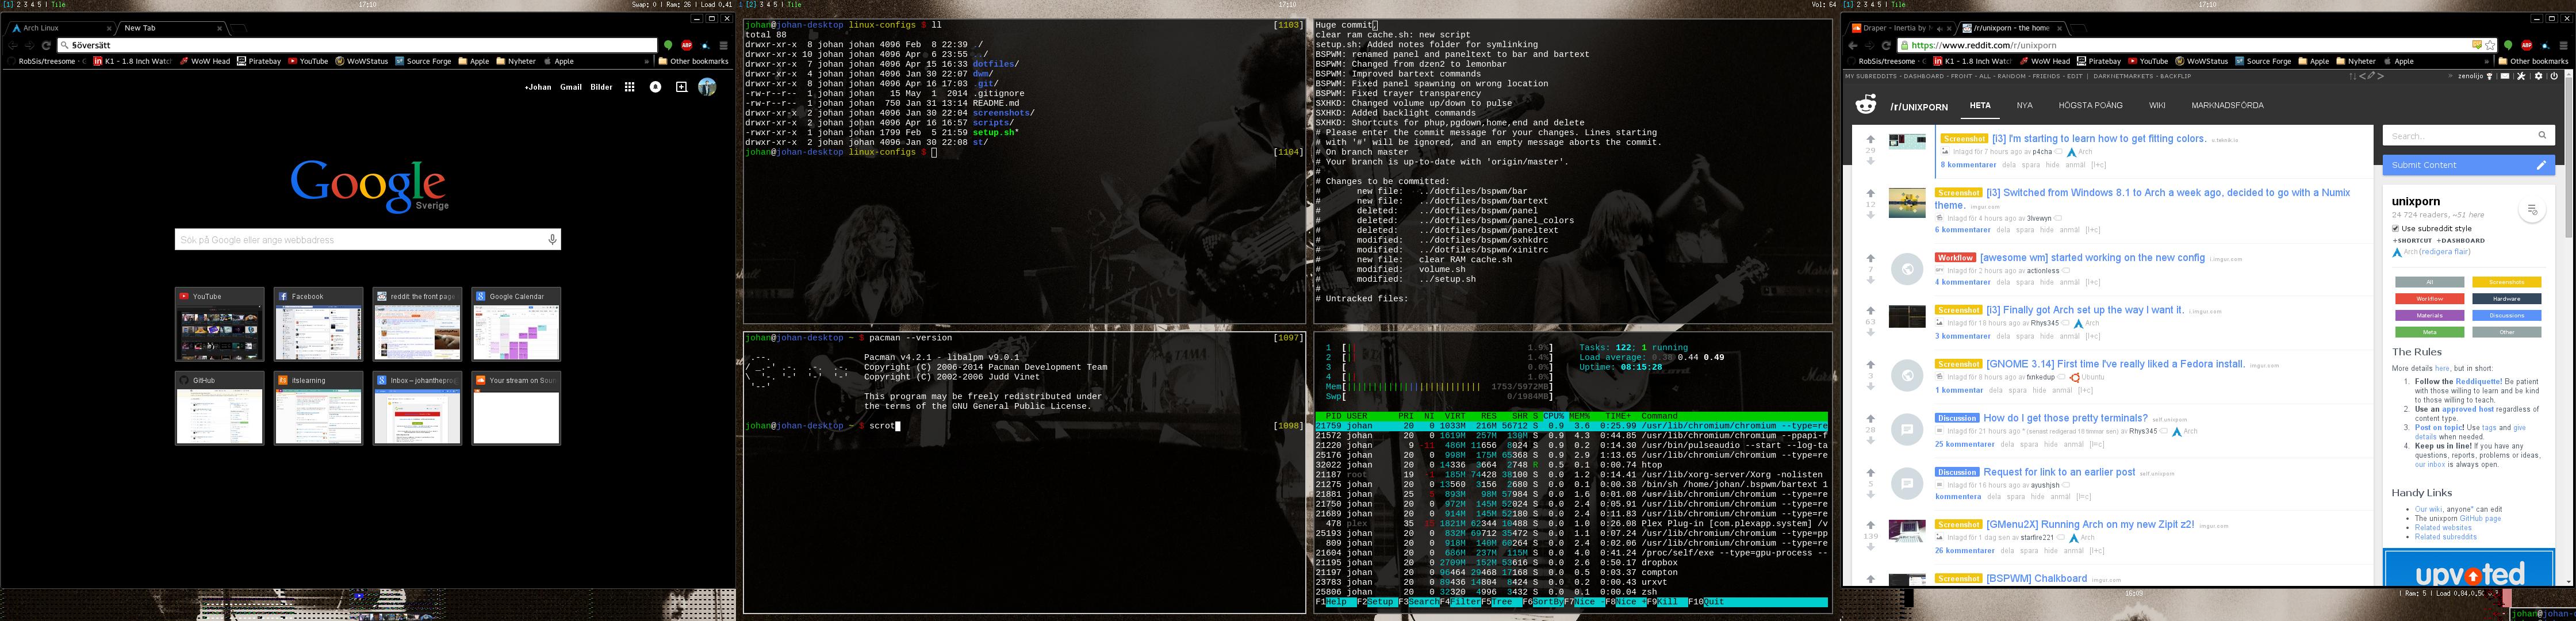 bspwm 2015-04-desktop-busy.png